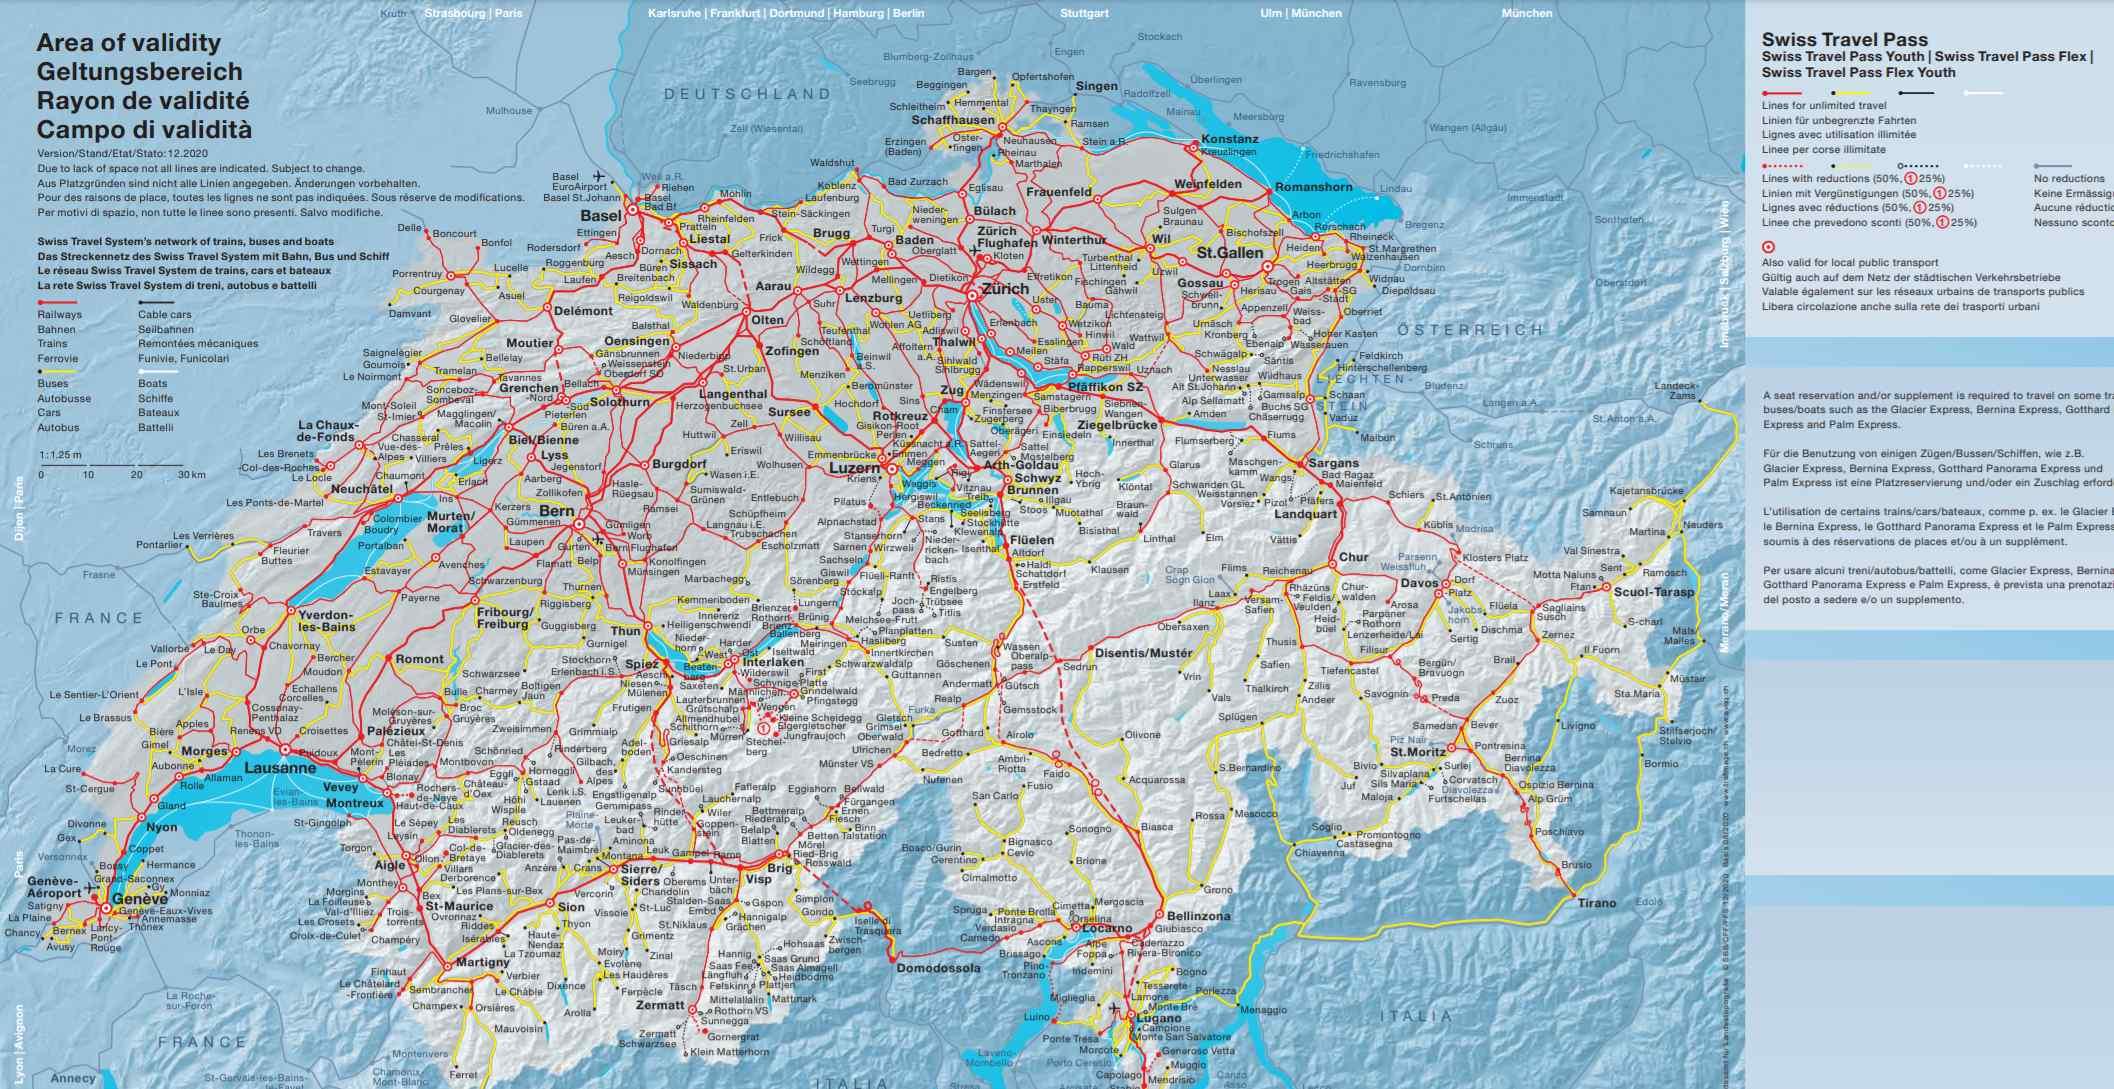 mapa area de validade swiss travel pass